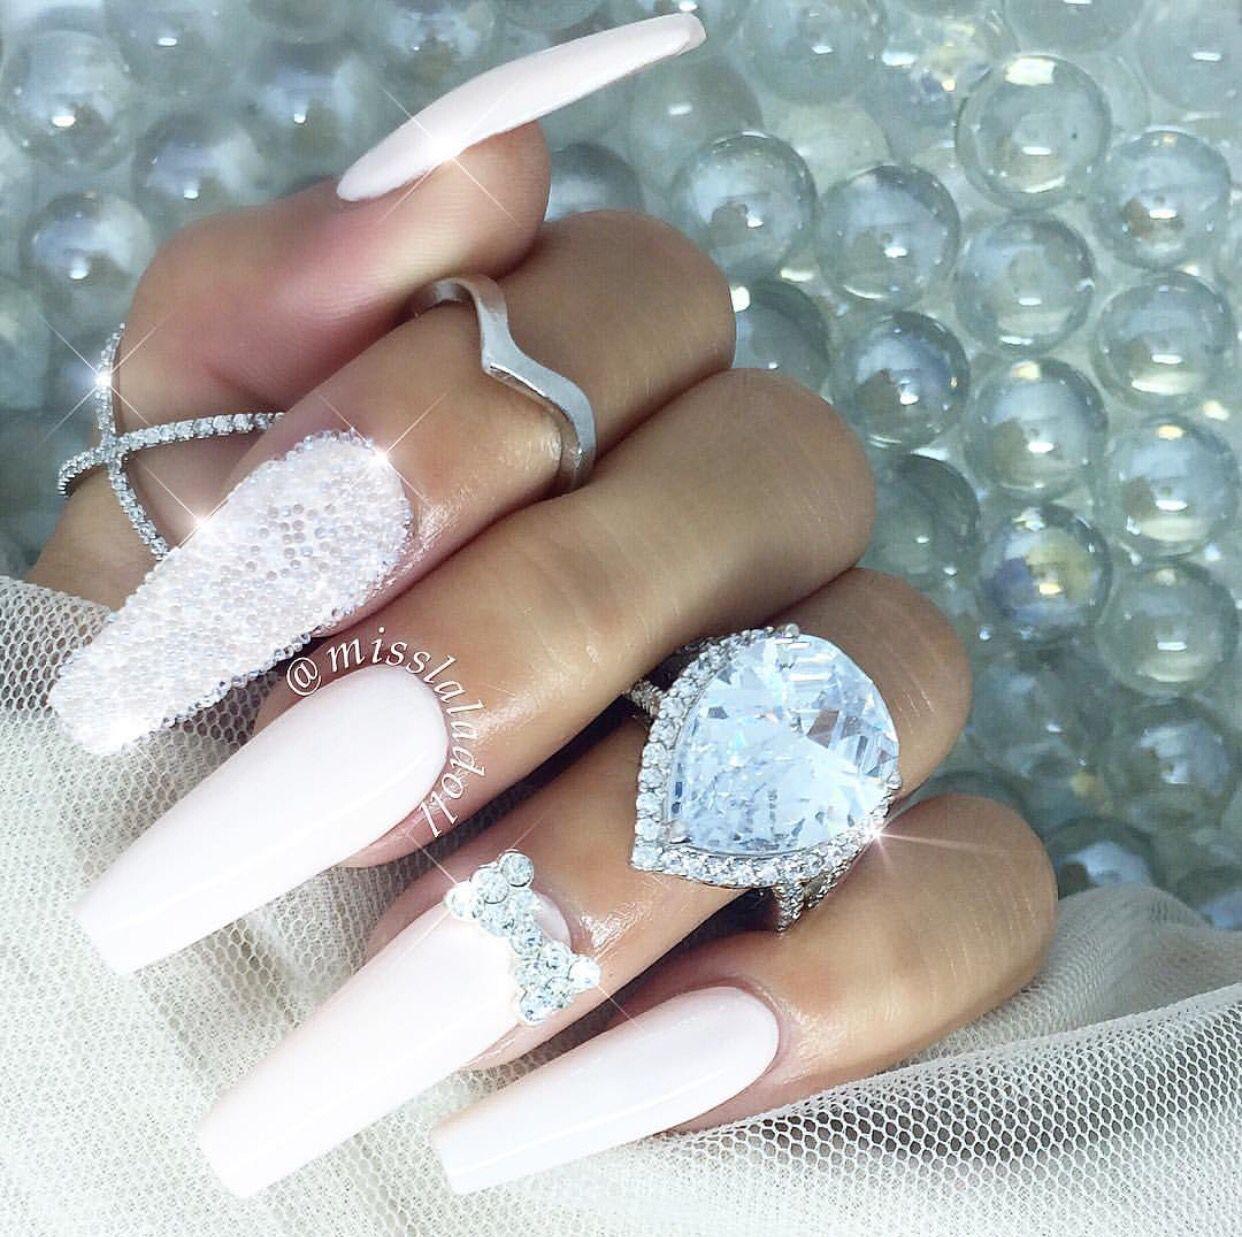 Pin by Taysha on Nailssss | Pinterest